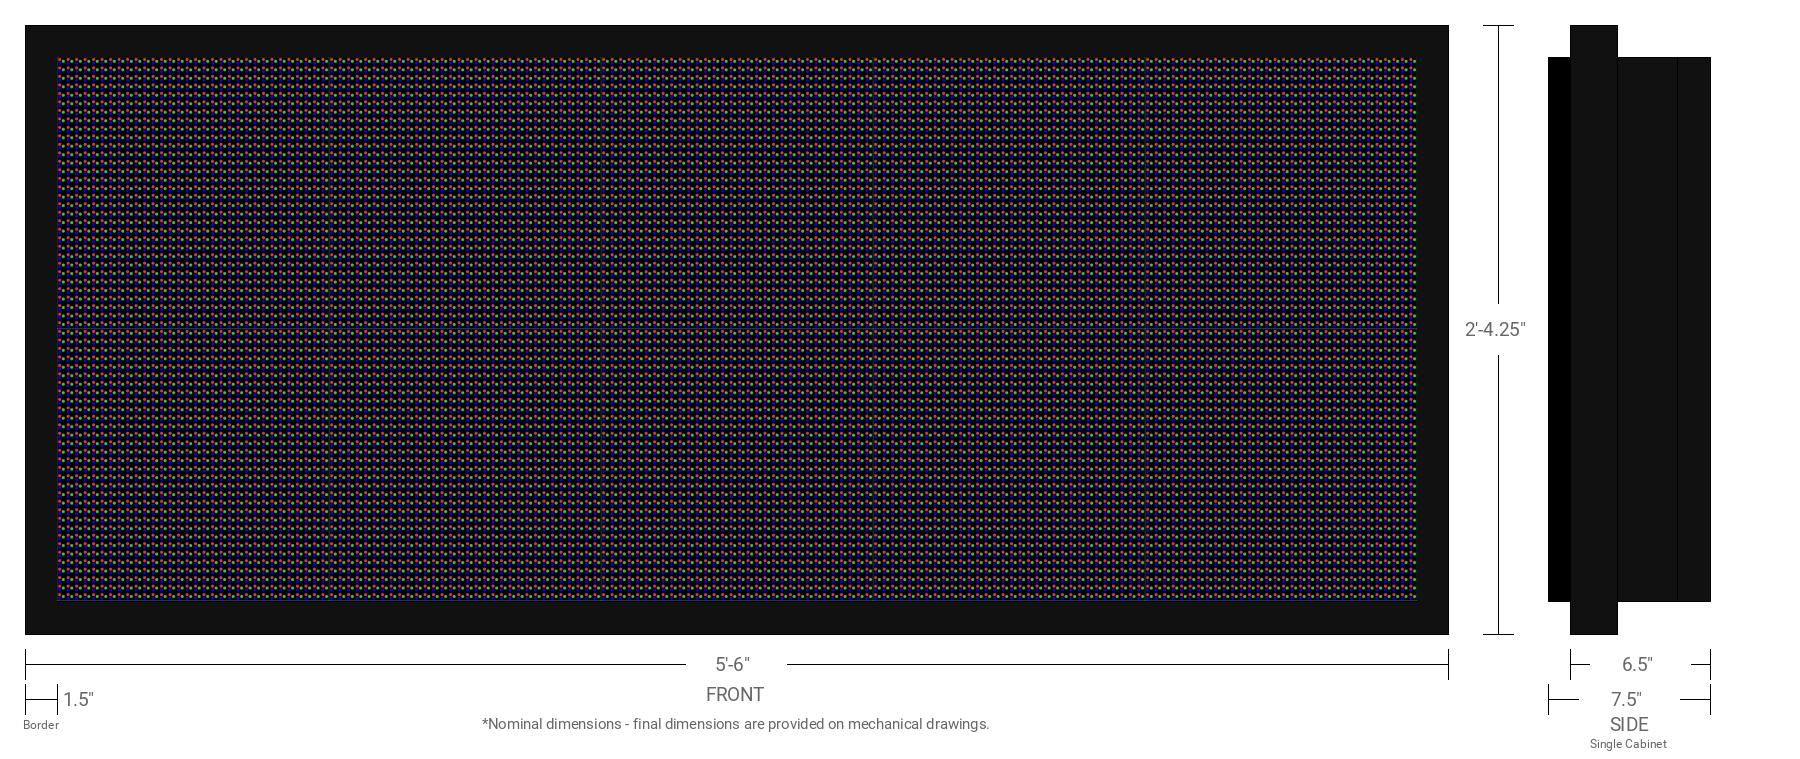 Aurora 10mm 64x160 Single Sided Full Color LED Display